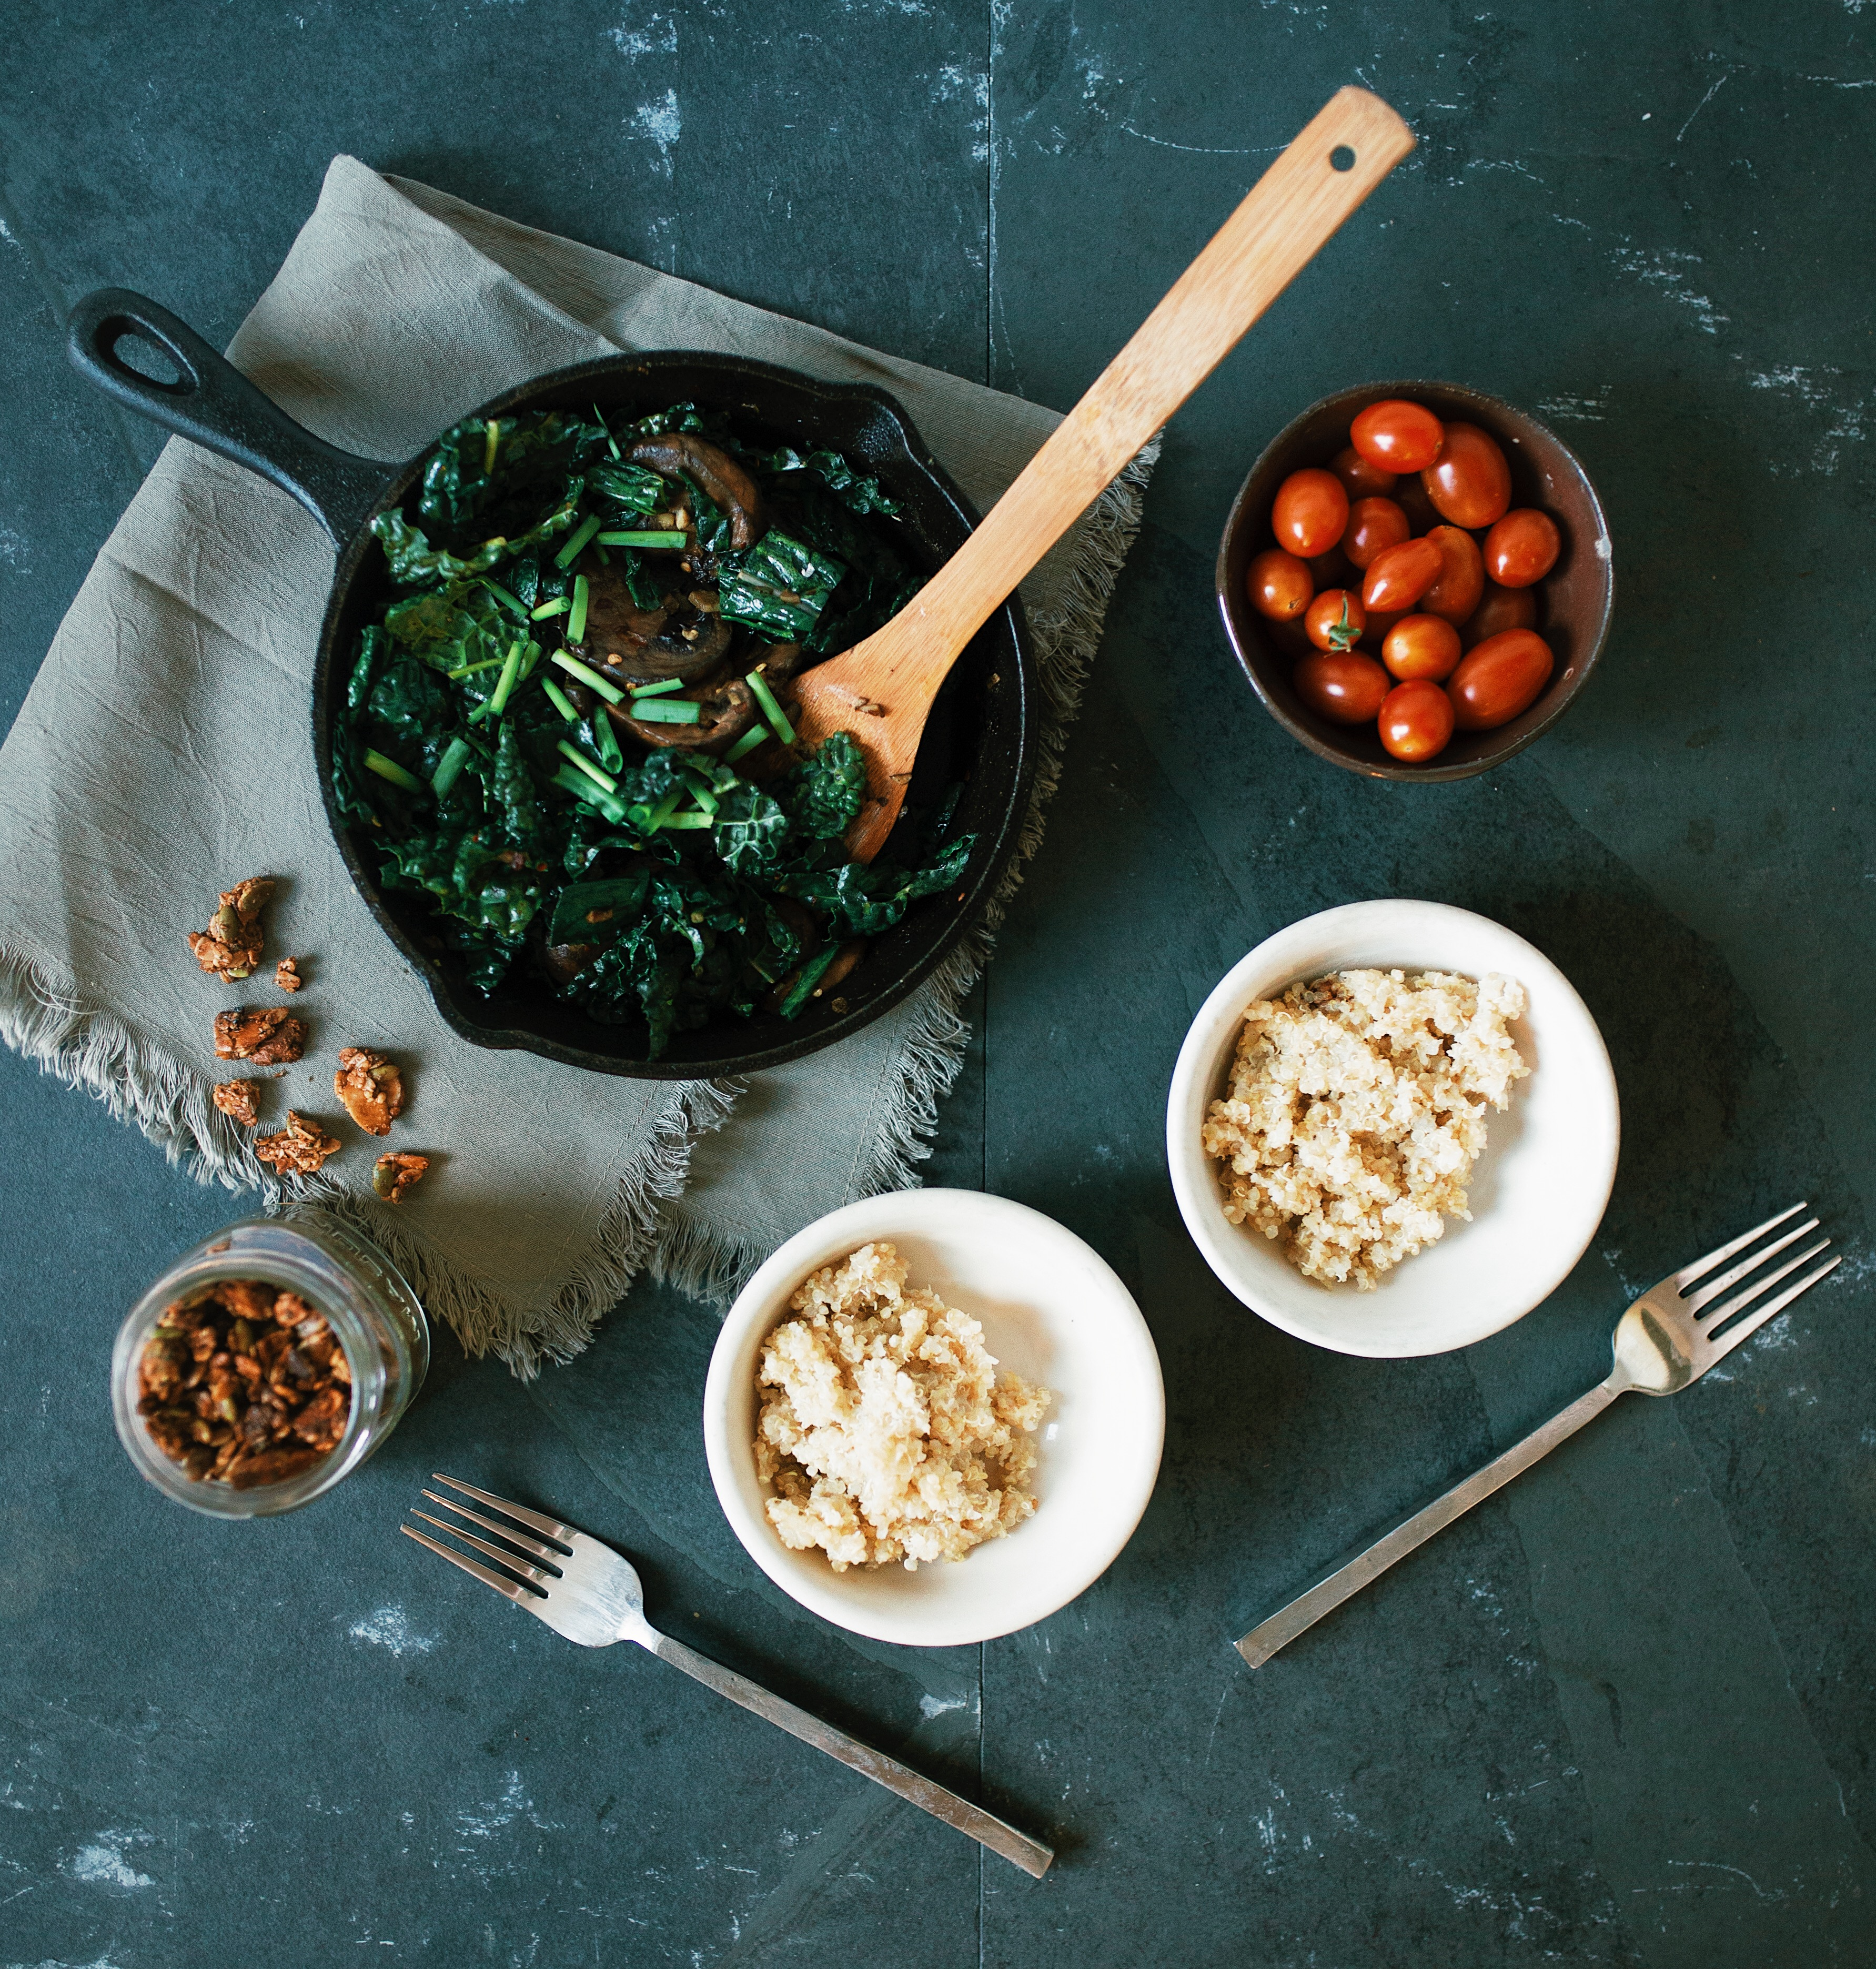 kale and quinoa recipe